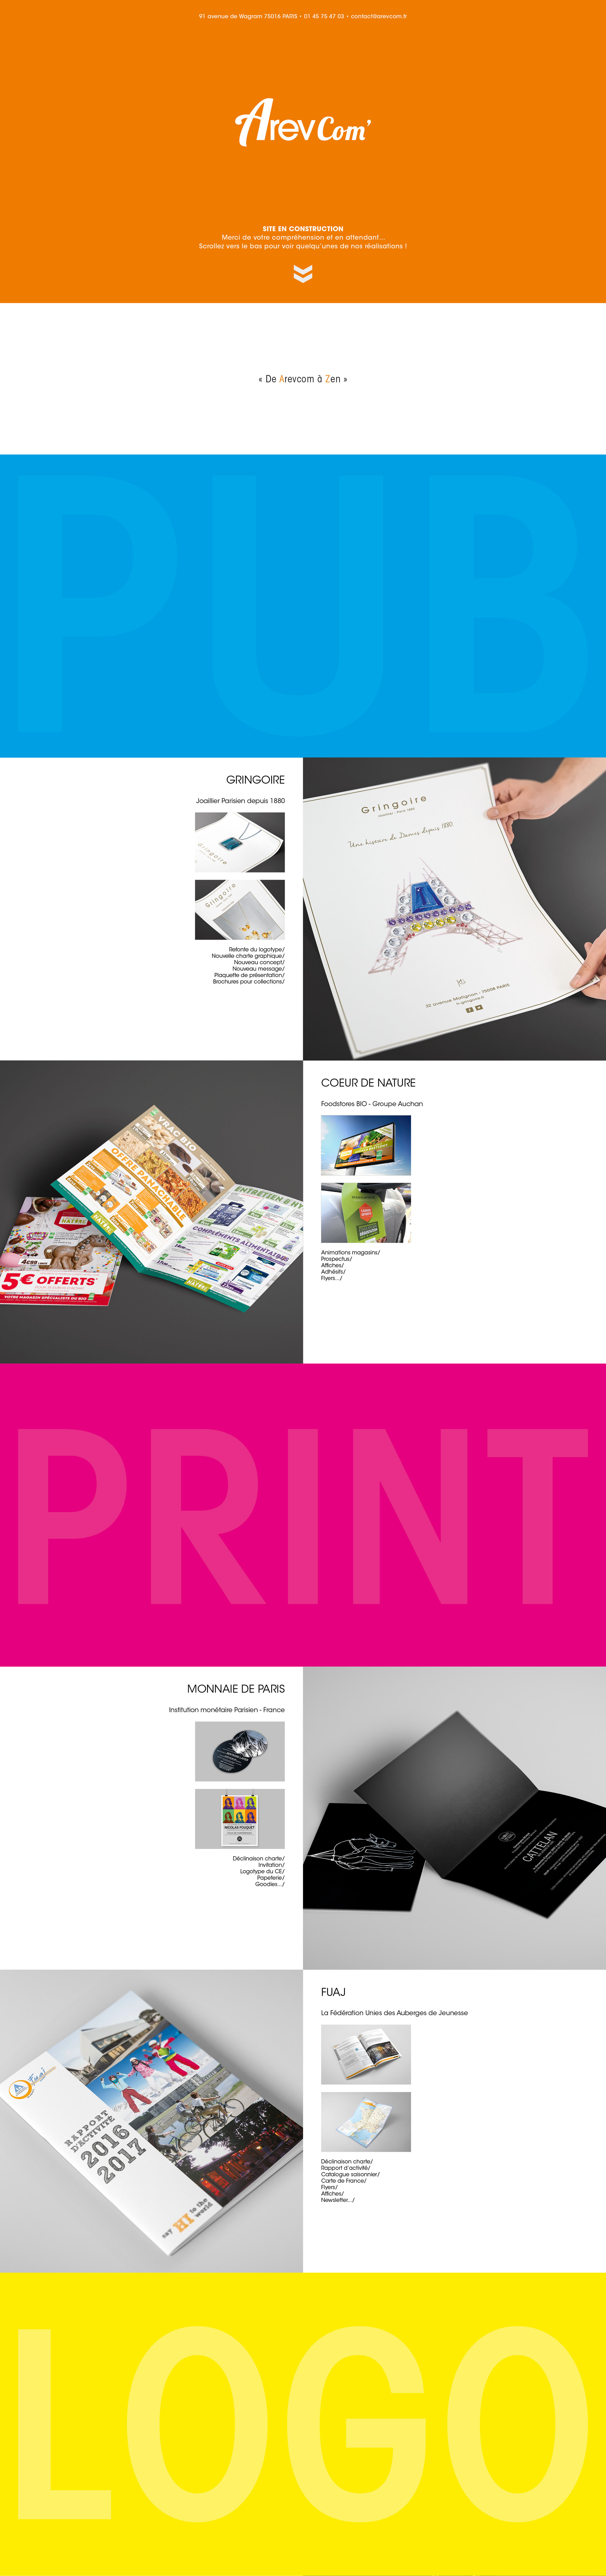 BOOK-Site-arevcom-agence-communication1